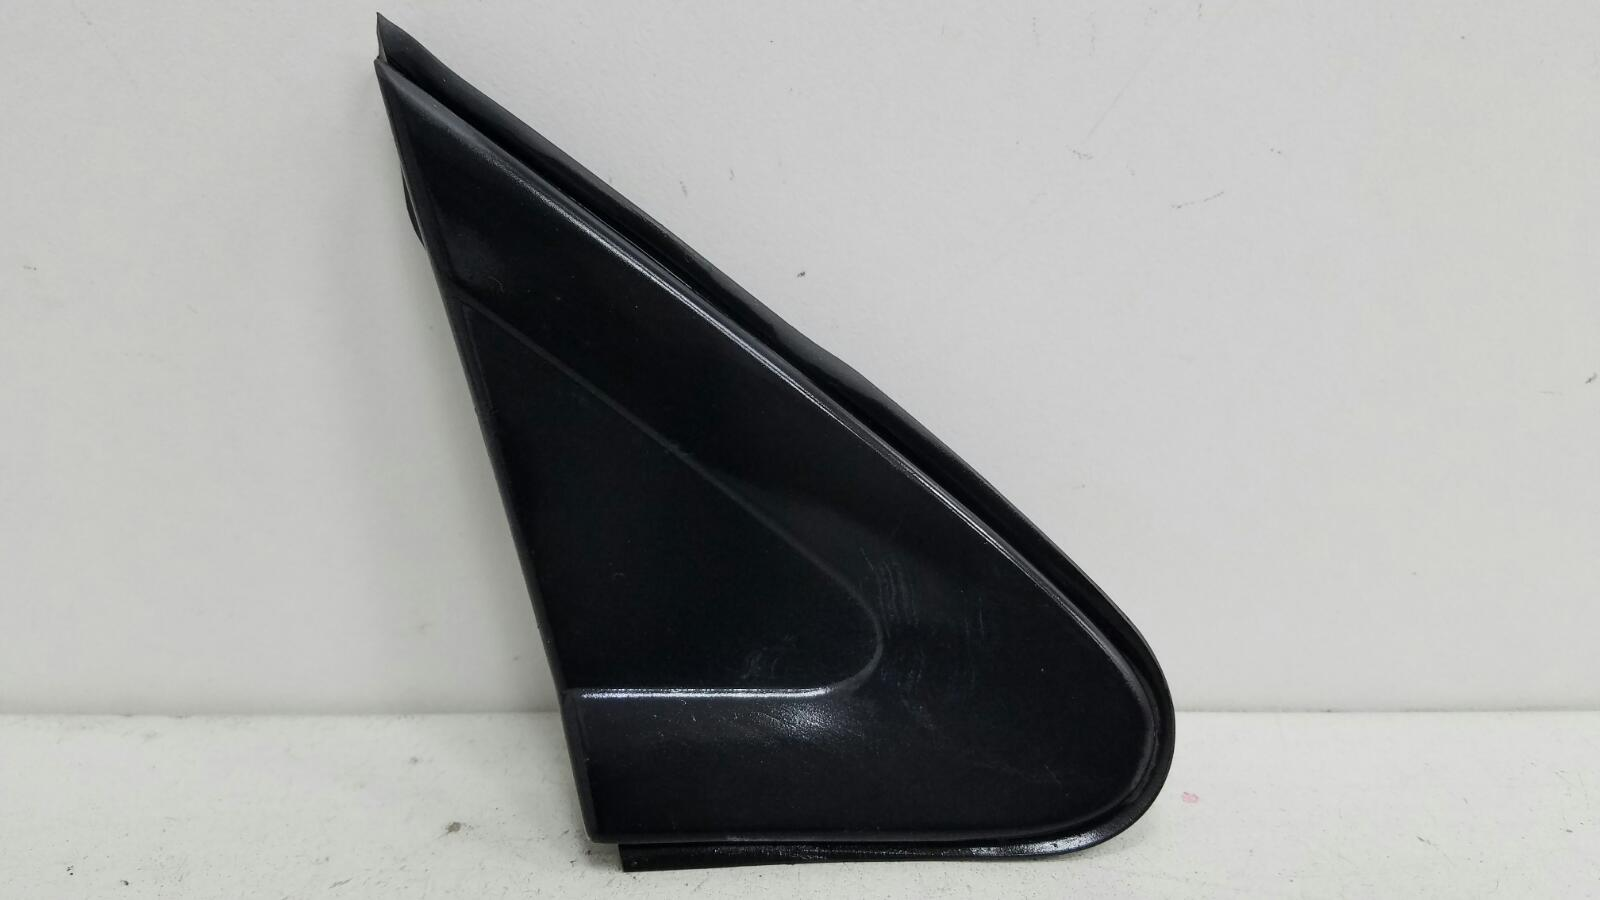 Накладка уголок двери заглушка зеркала Mitsubishi Lanser 9 CSA 4G18 2003 передняя левая